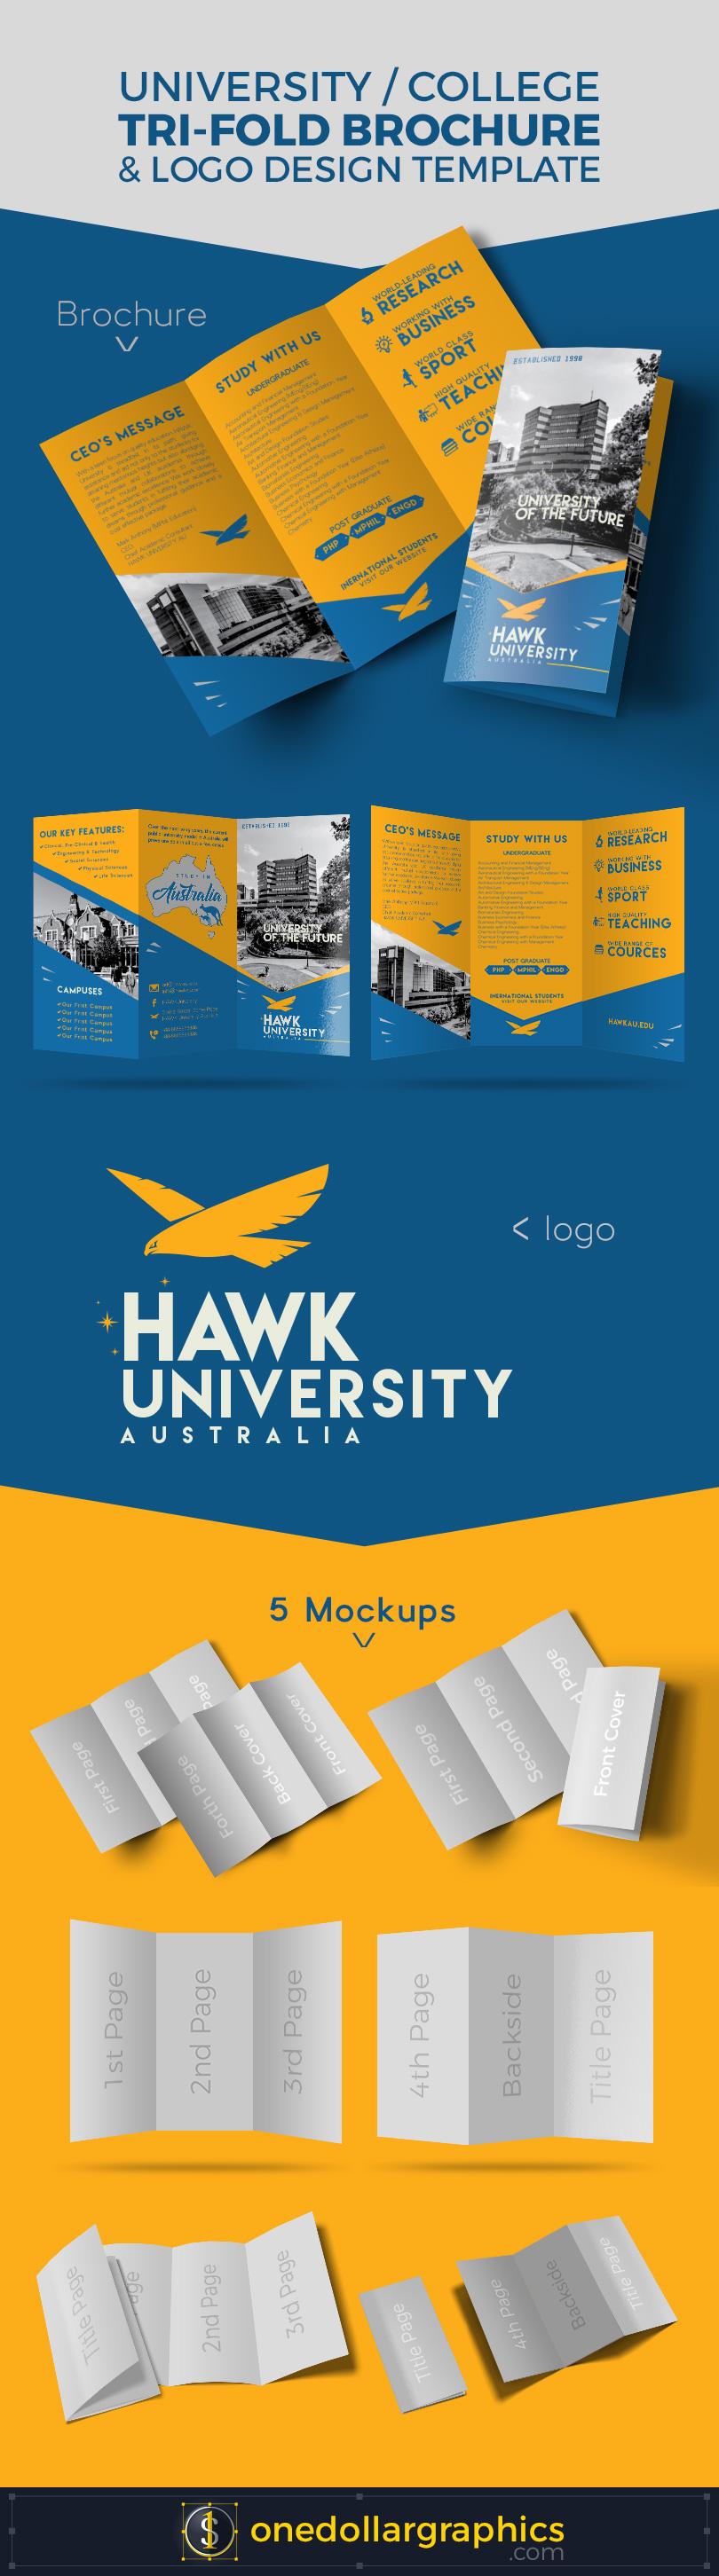 College-University-Tri-Fold-Brochure-Design-&-Logo-Template